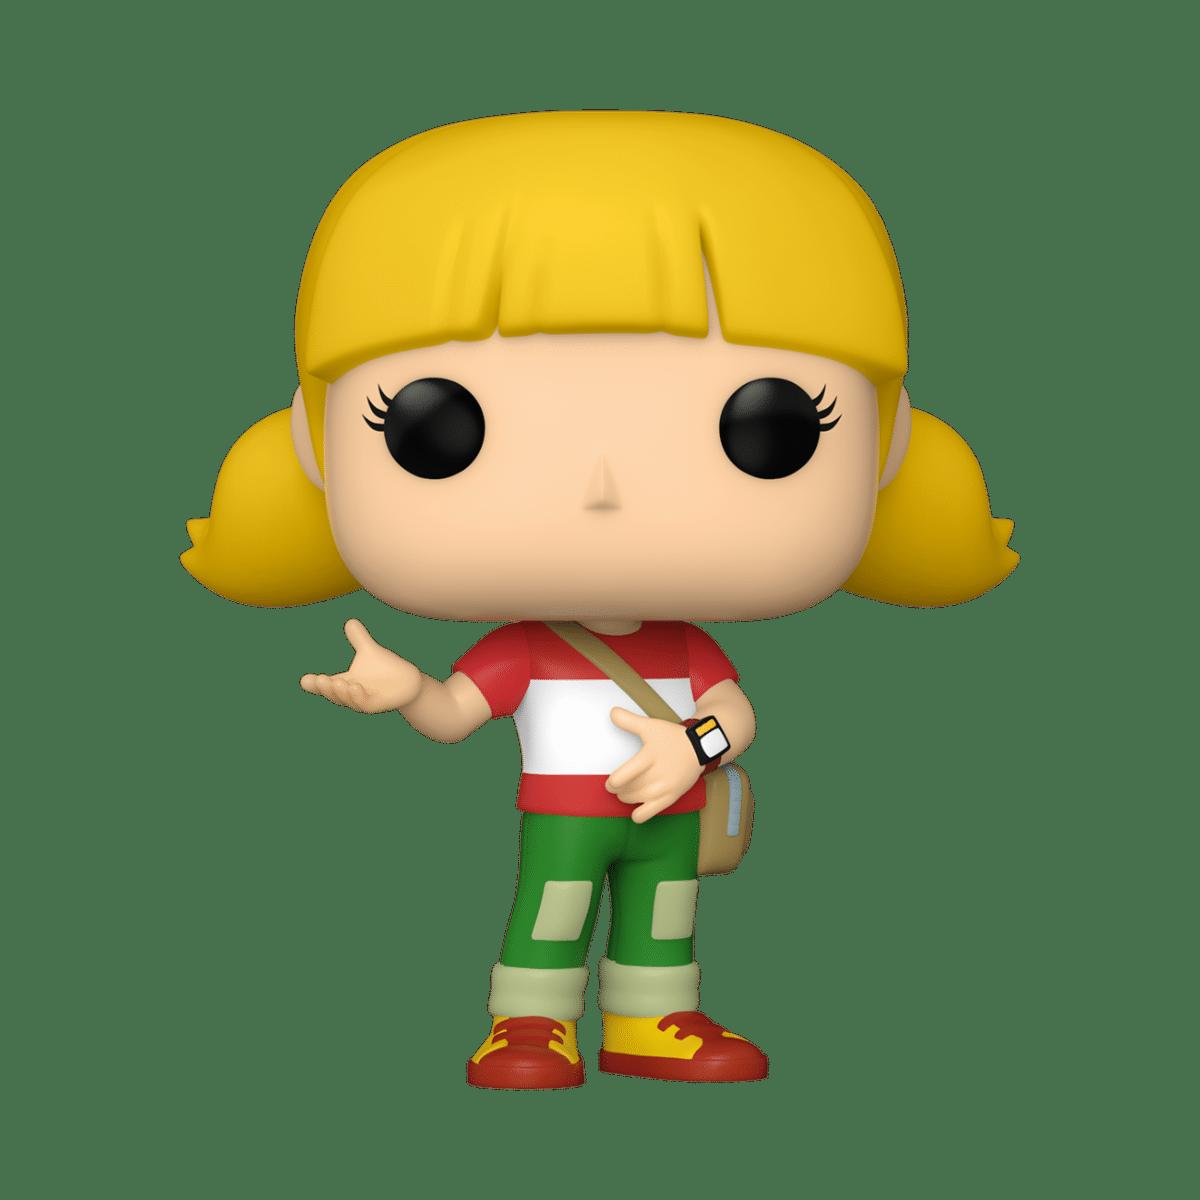 Penny #894